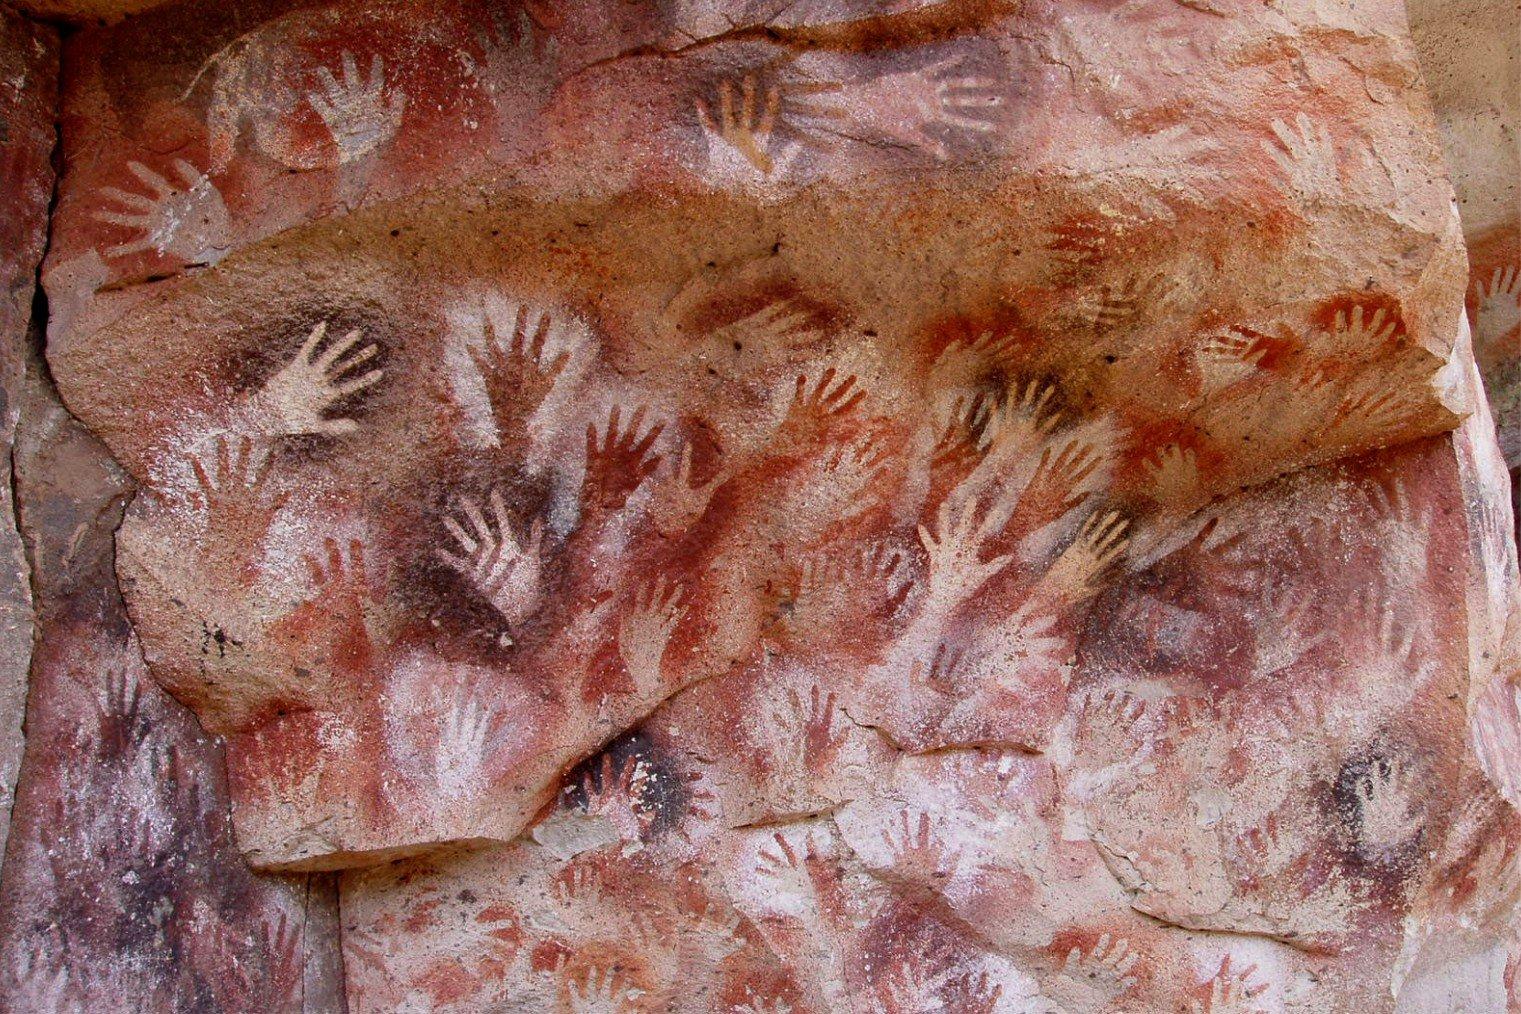 Пещера Рук (Куэва-де-лас-Манос). Cave of Hands (Cueva de las Manos), Argentina